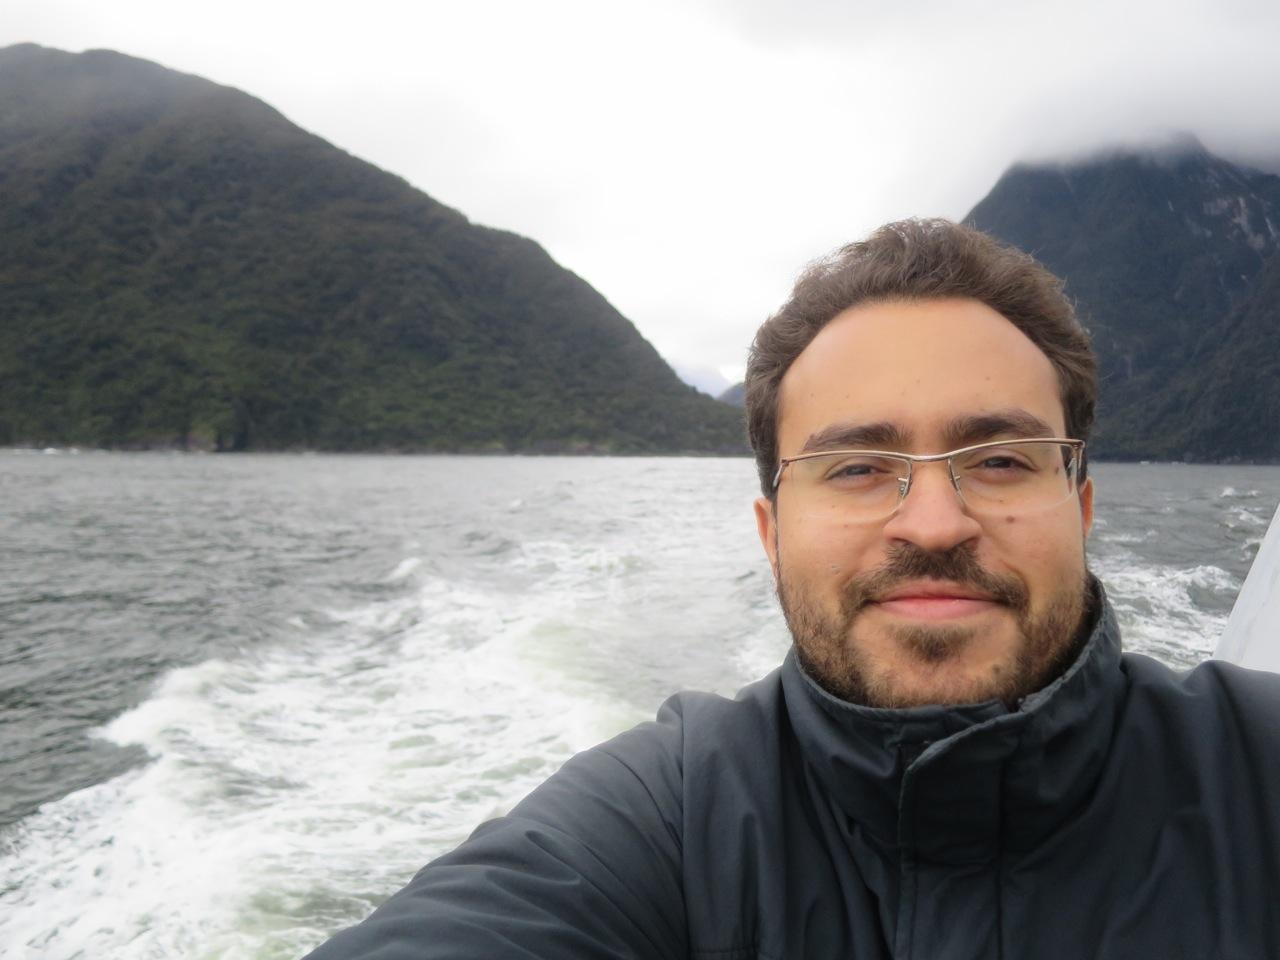 Milford Sound 1 31